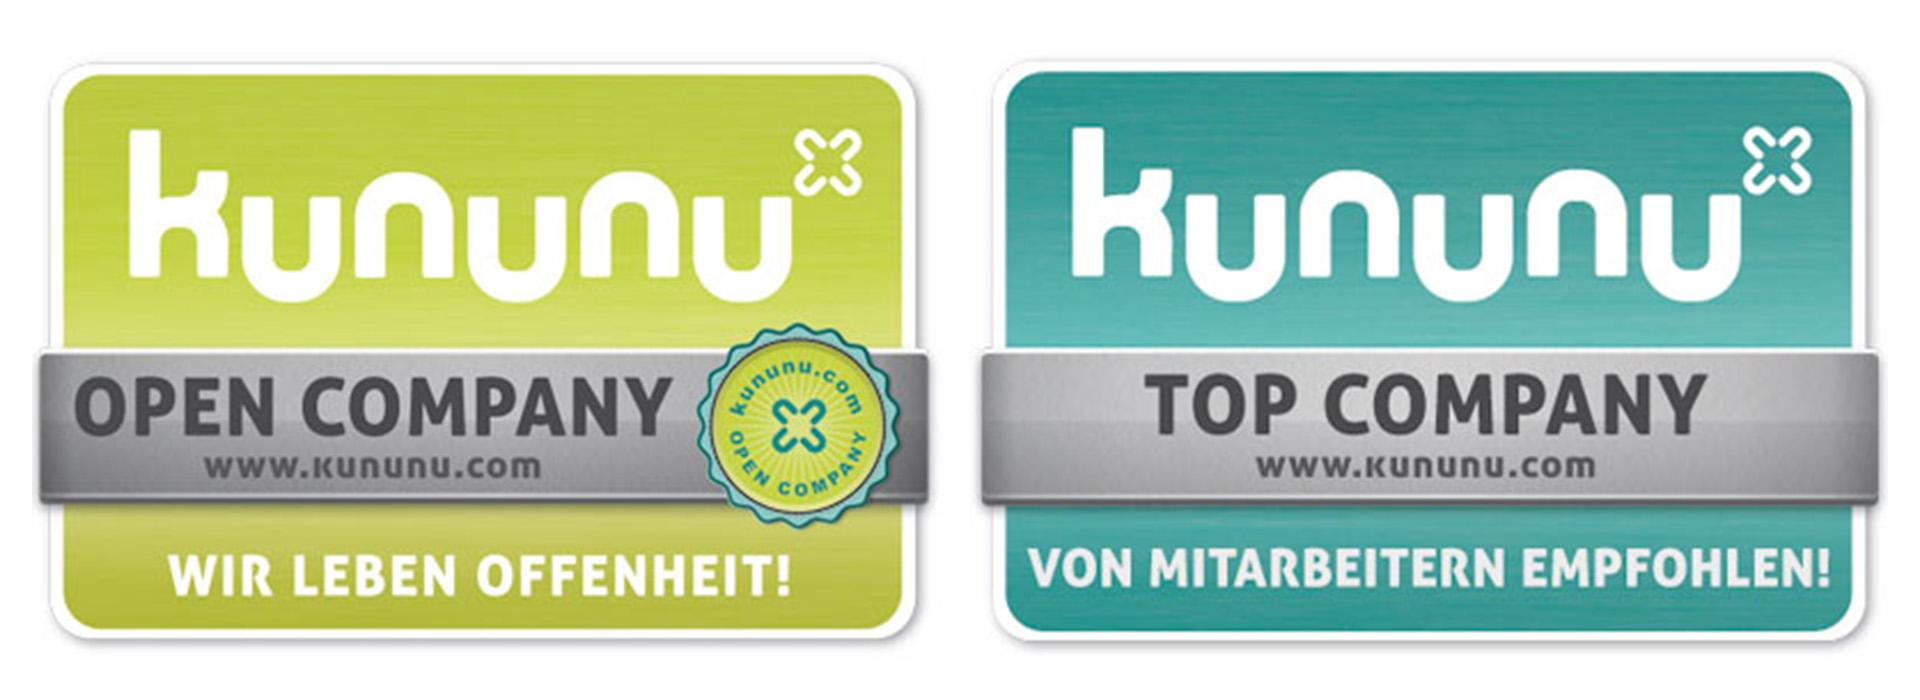 de-de_culture_kununu-logos_1920x700